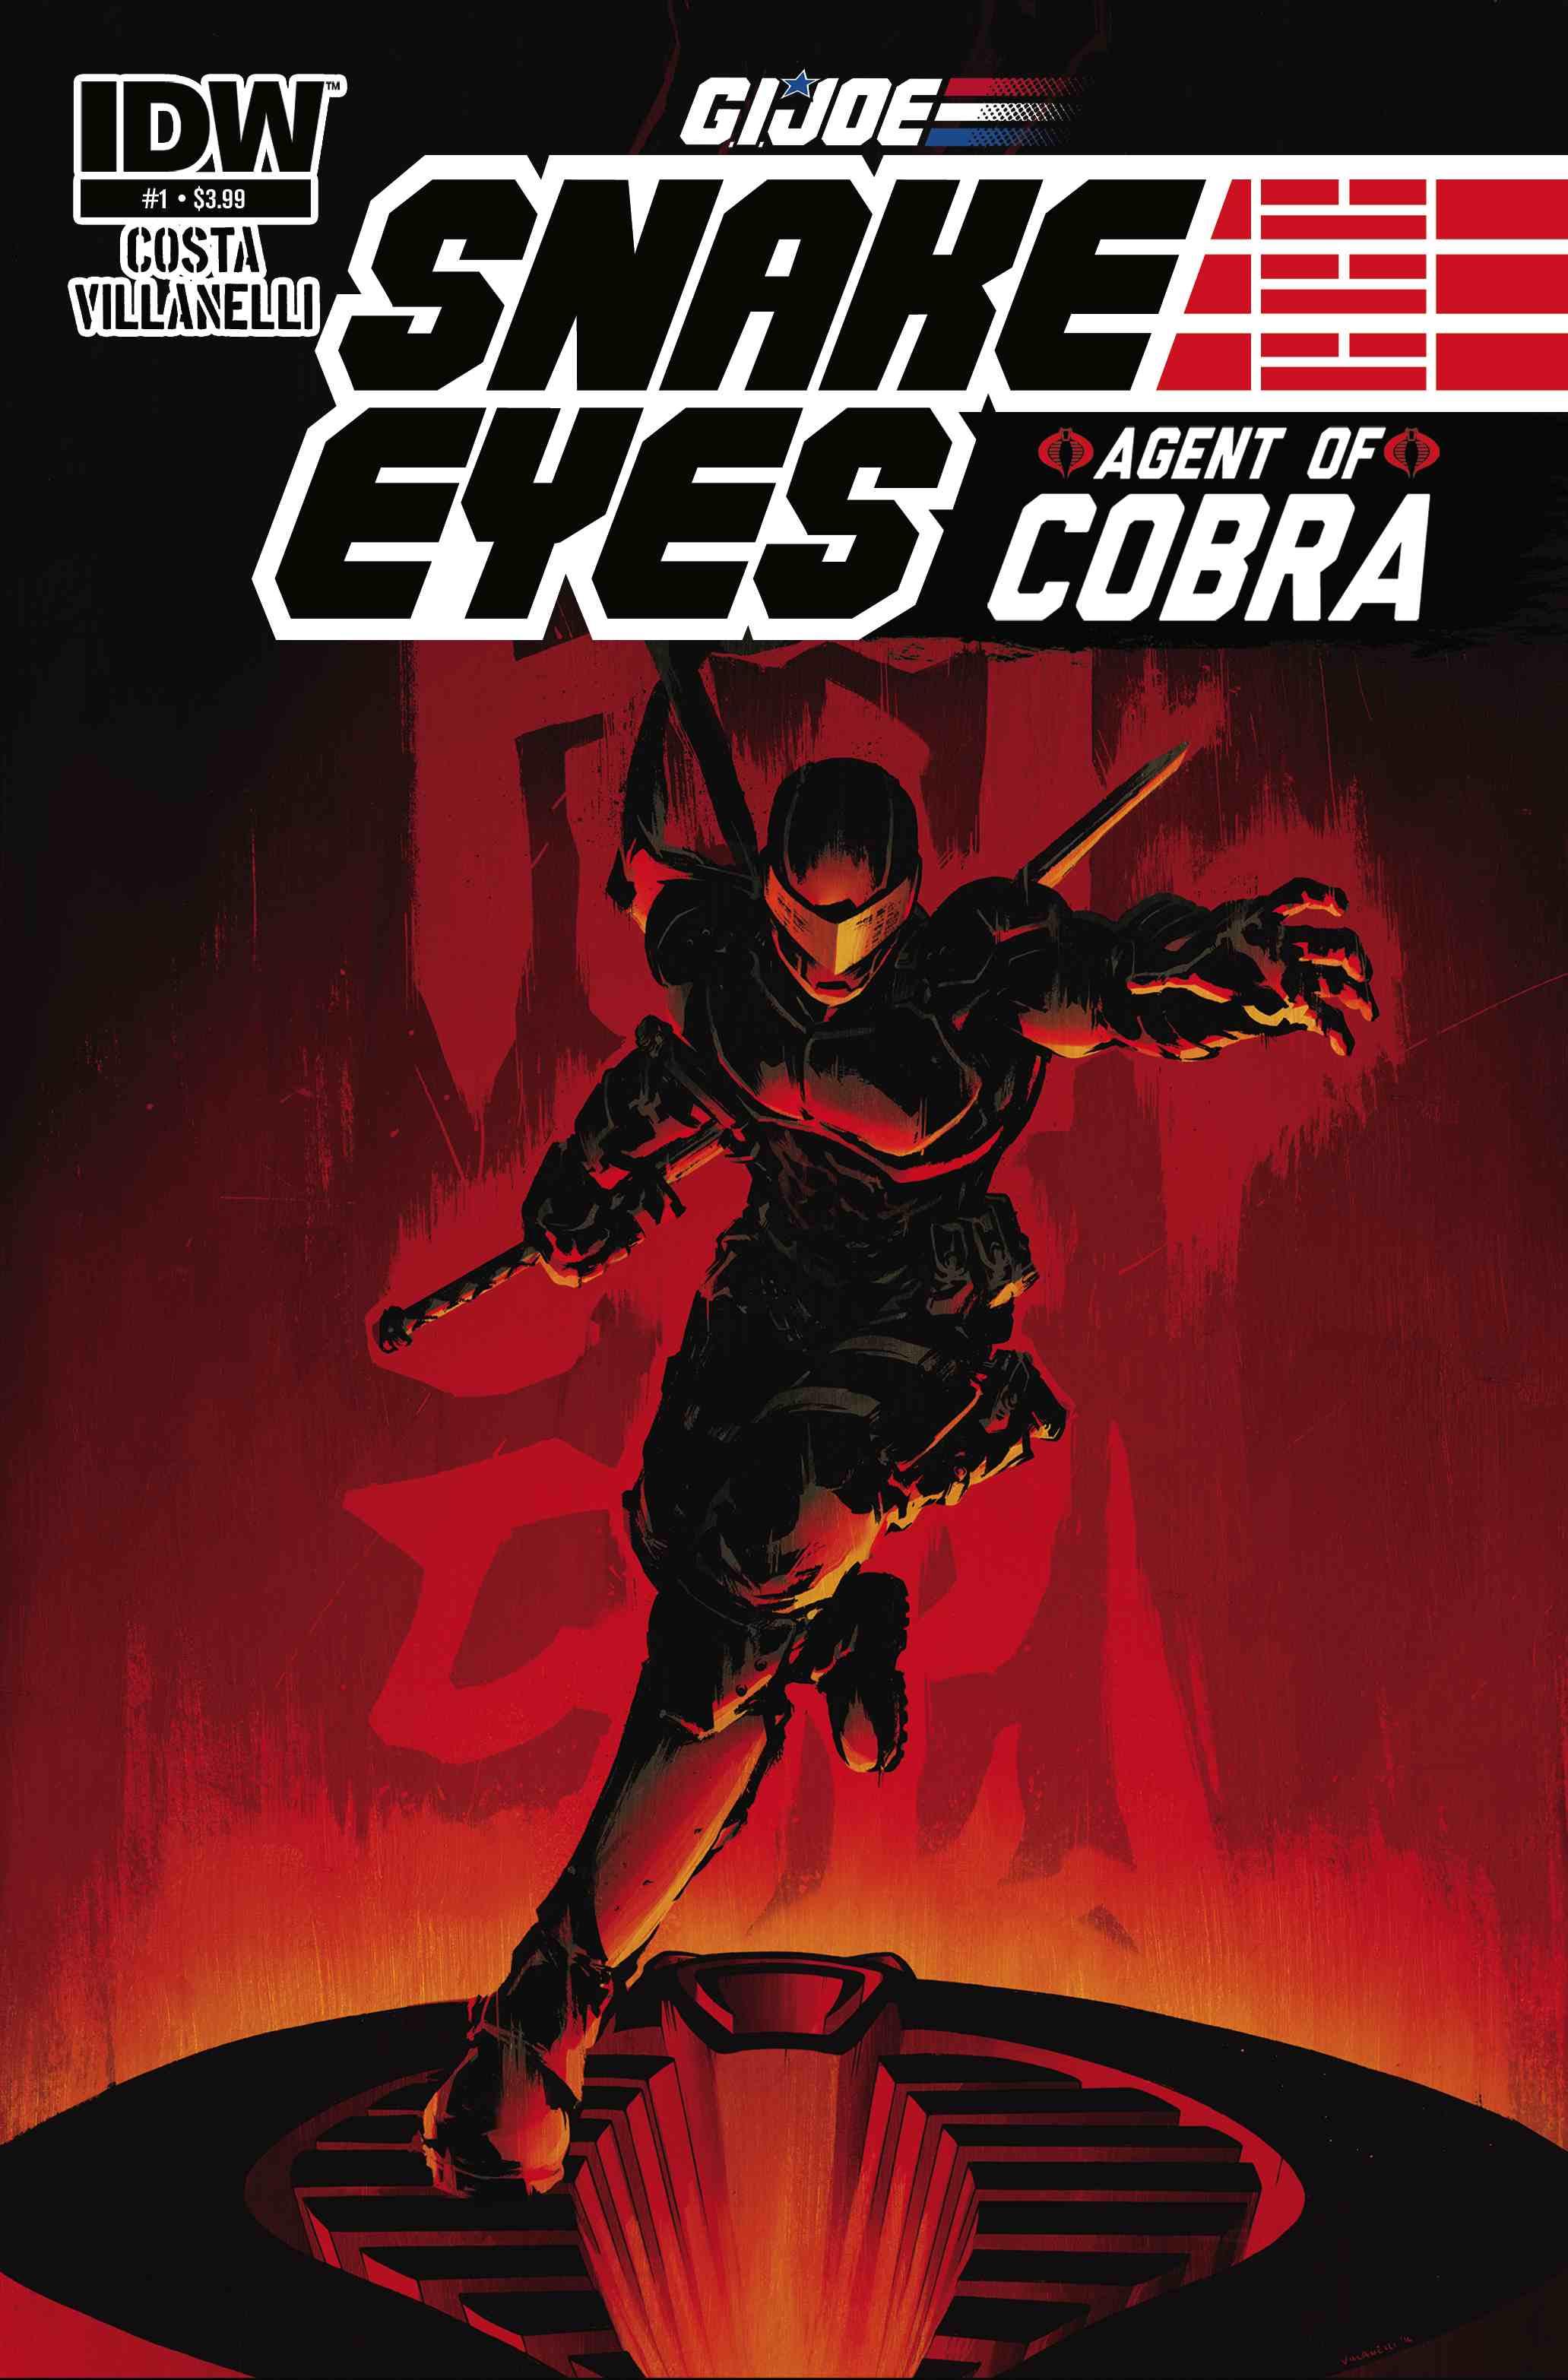 Say It Aint So Joe >> Snake Eyes: Agent of Cobra #1 - Say It Ain't So Joe, Say It Ain't So! ~ What'cha Reading?